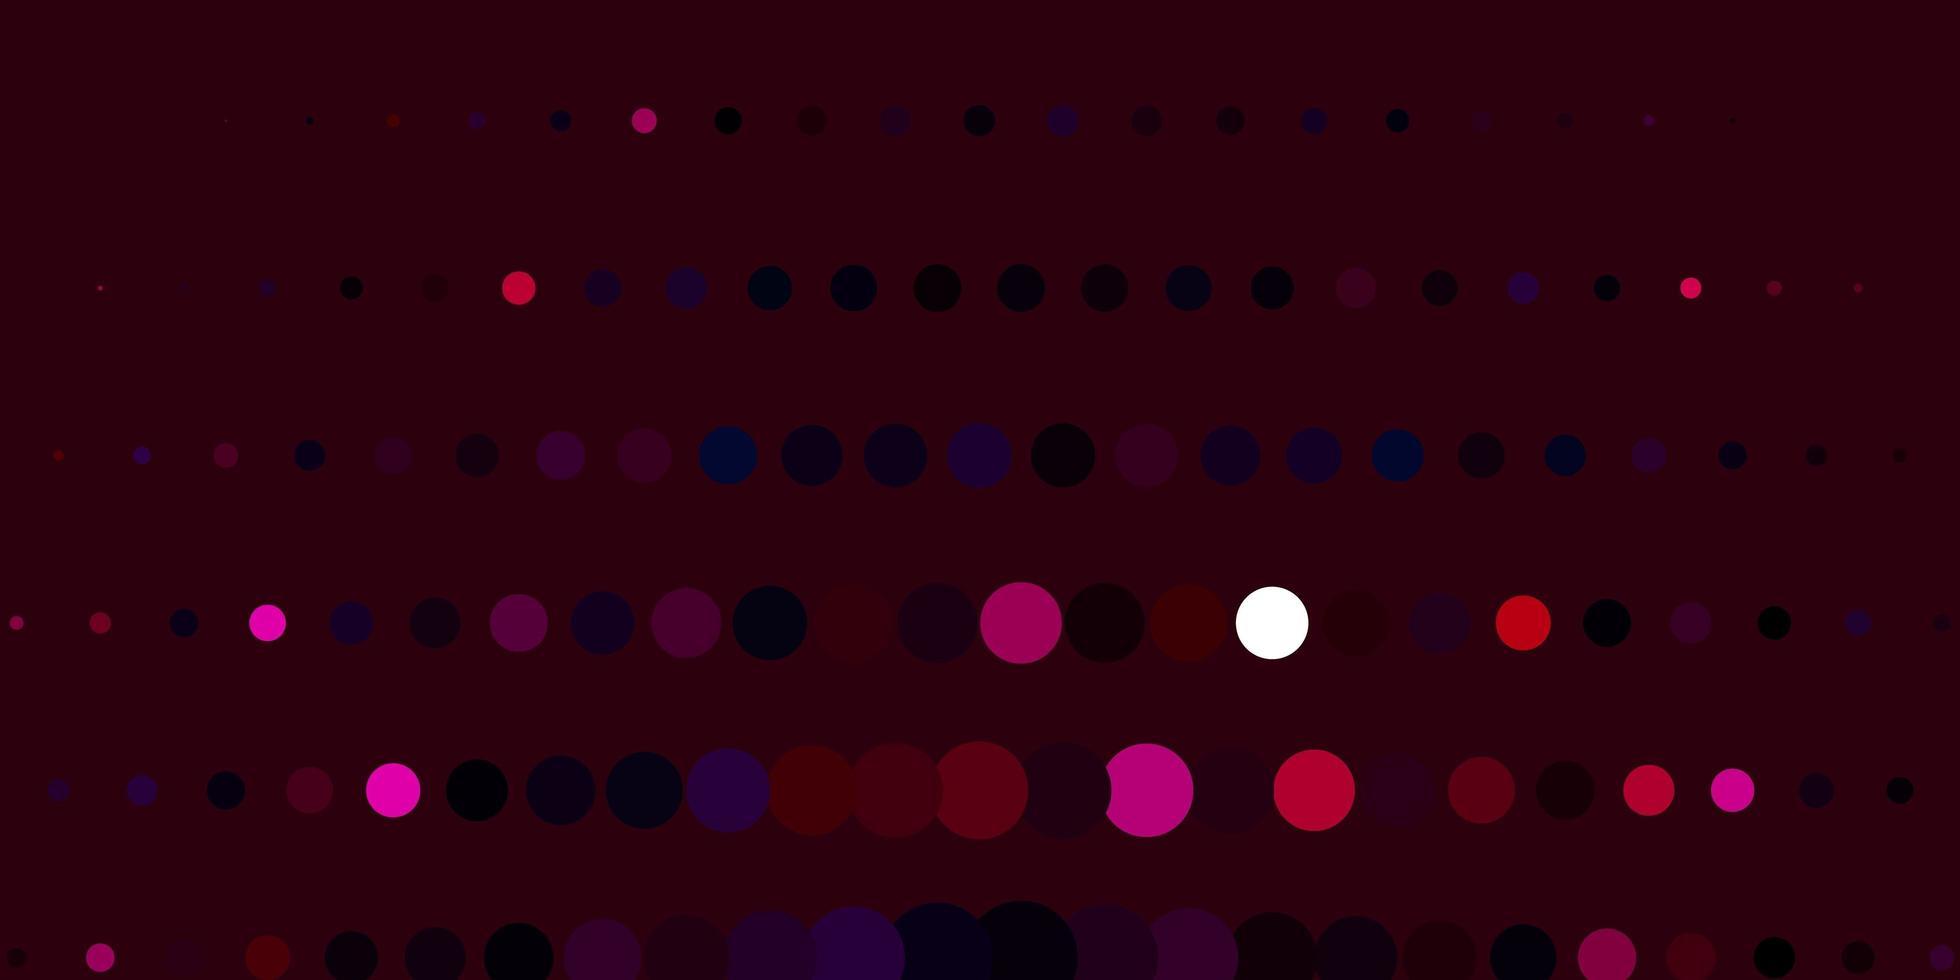 textura vector roxo escuro com círculos.